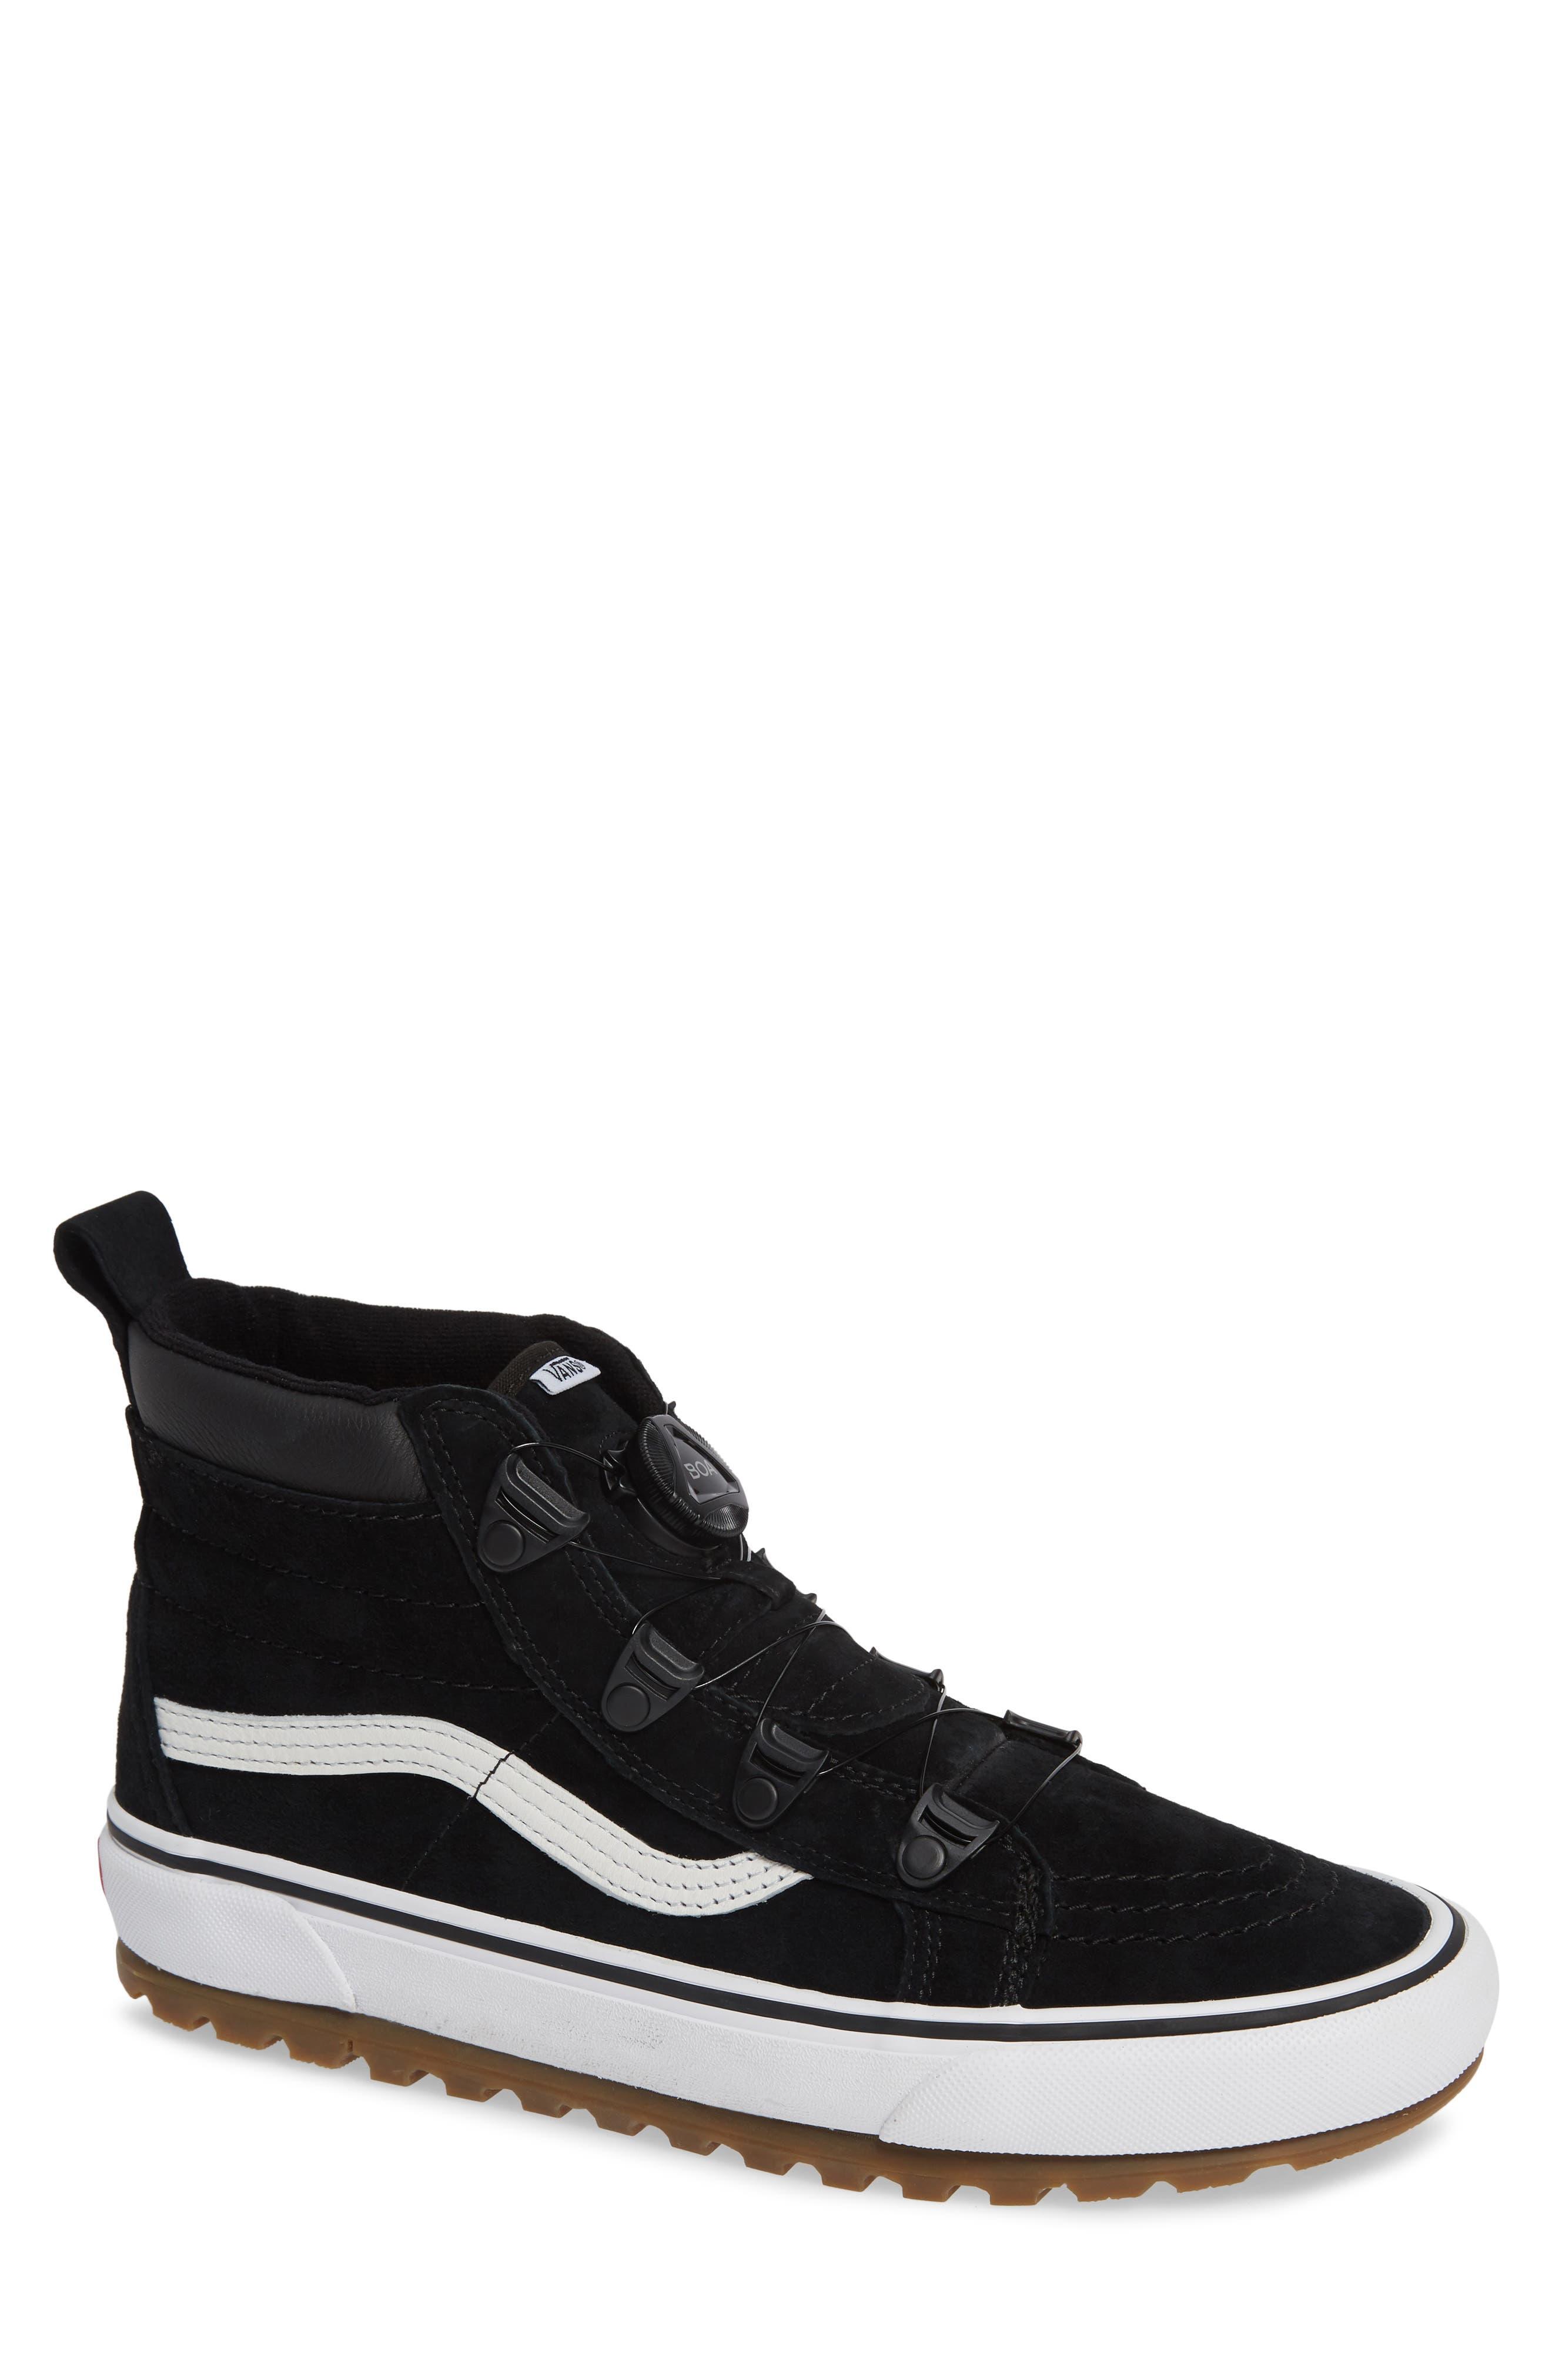 1bea5c844f1 Vans hi mte boa sneaker in black true white modesens jpg 780x838 Vans sk8  hi mte